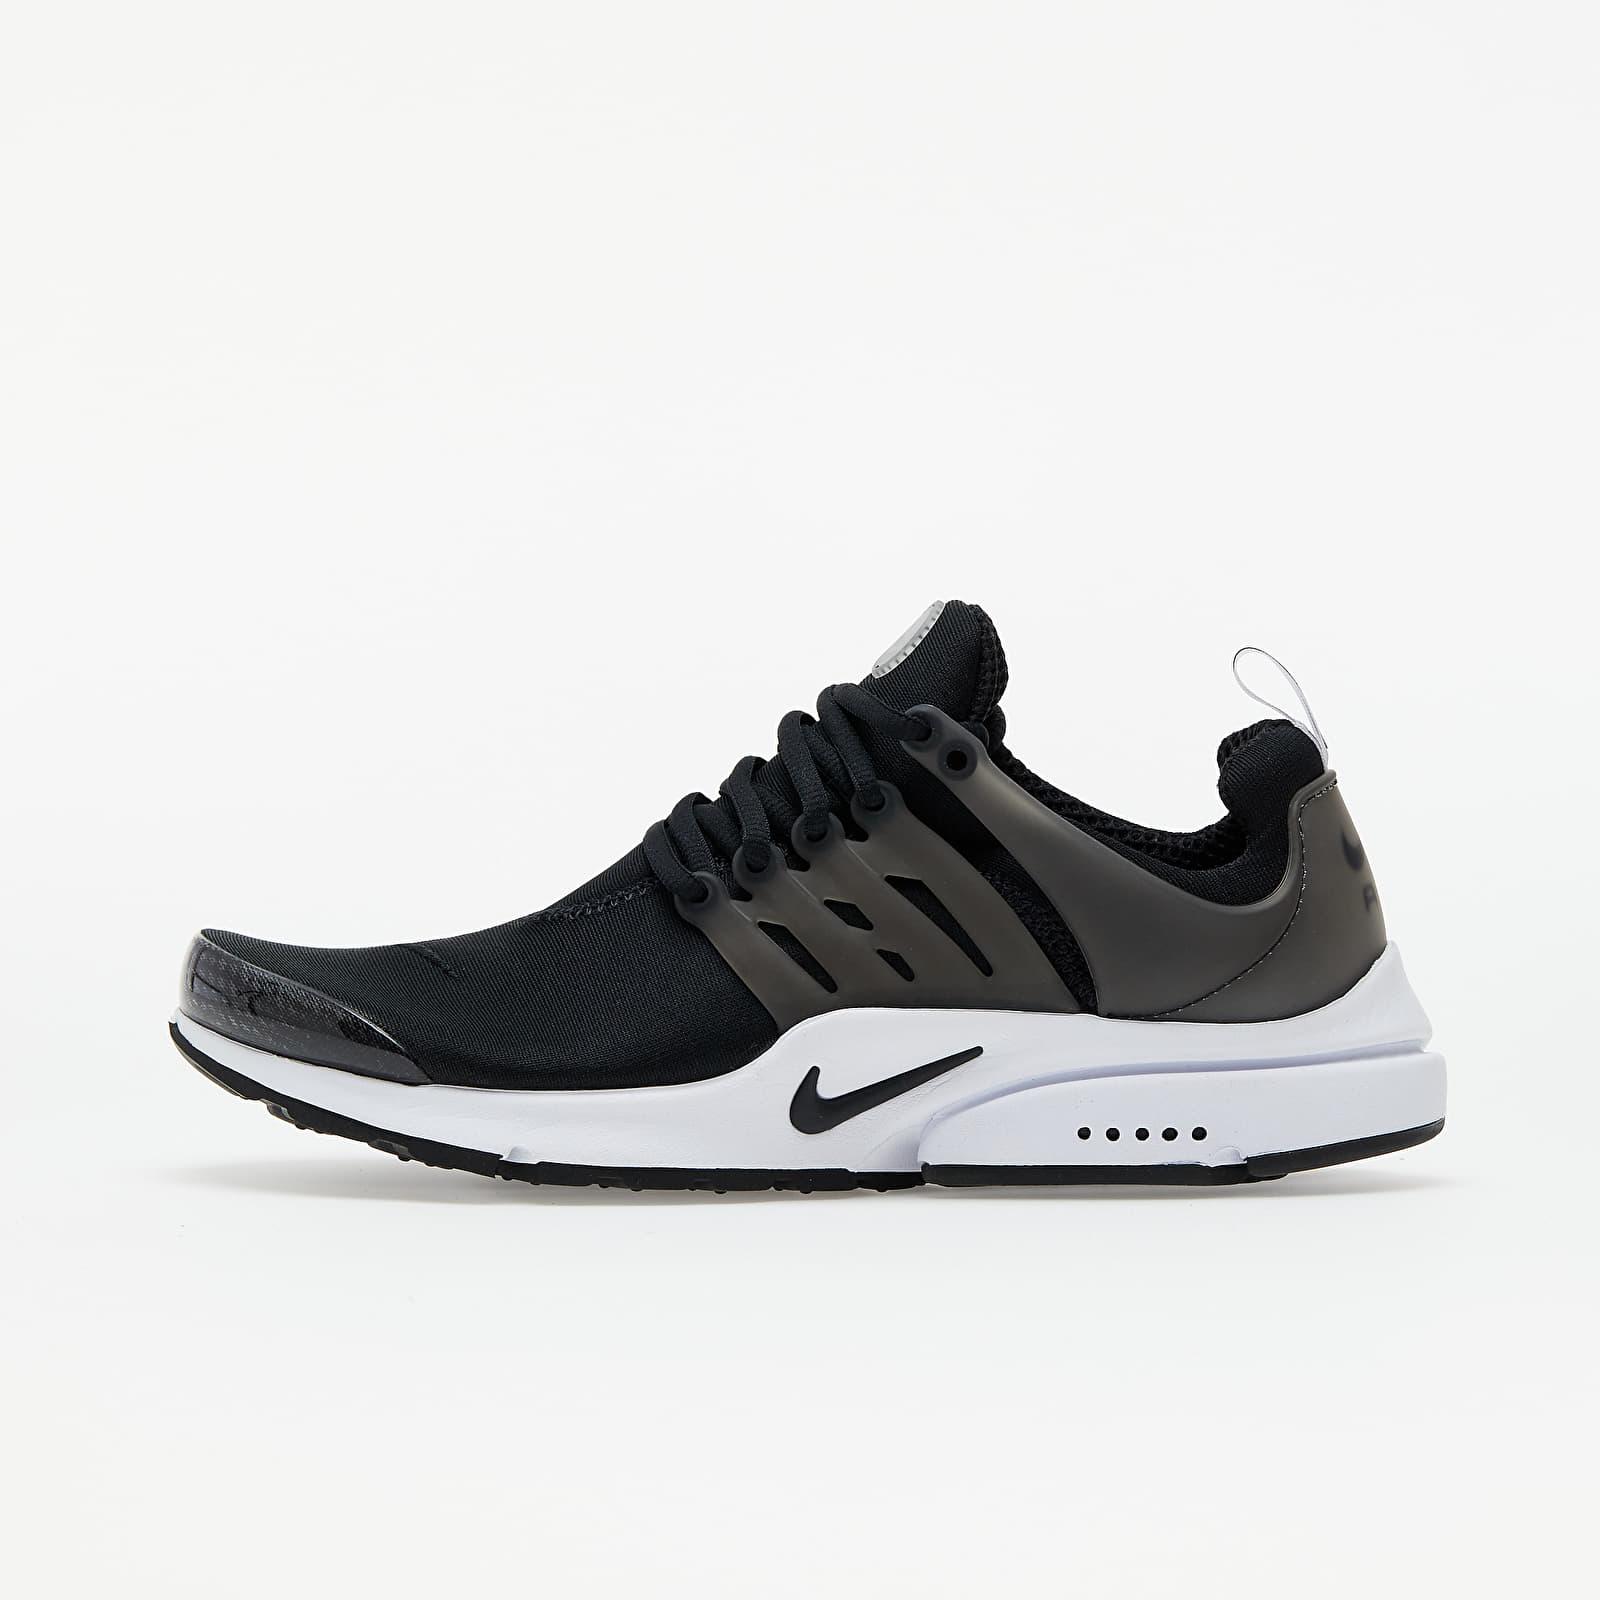 Nike Air Presto Black/ Black-White EUR 44